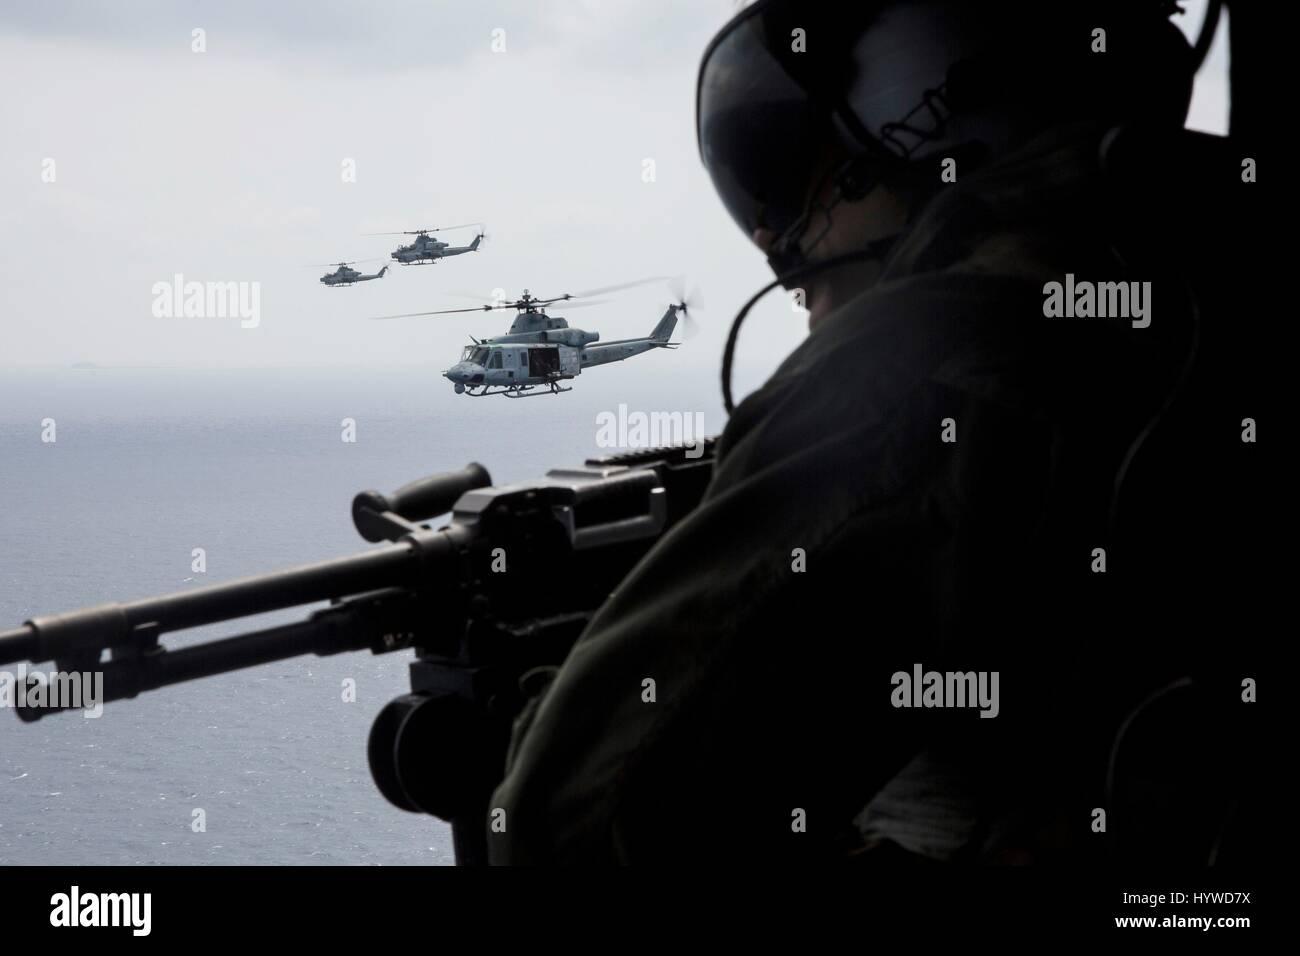 Owinawa, Japan. 26th Apr, 2017. U.S. Marine Corps Sgt. Mark Alvarez, mans the door gun on a UH-1Y Huey helicopter, Stock Photo